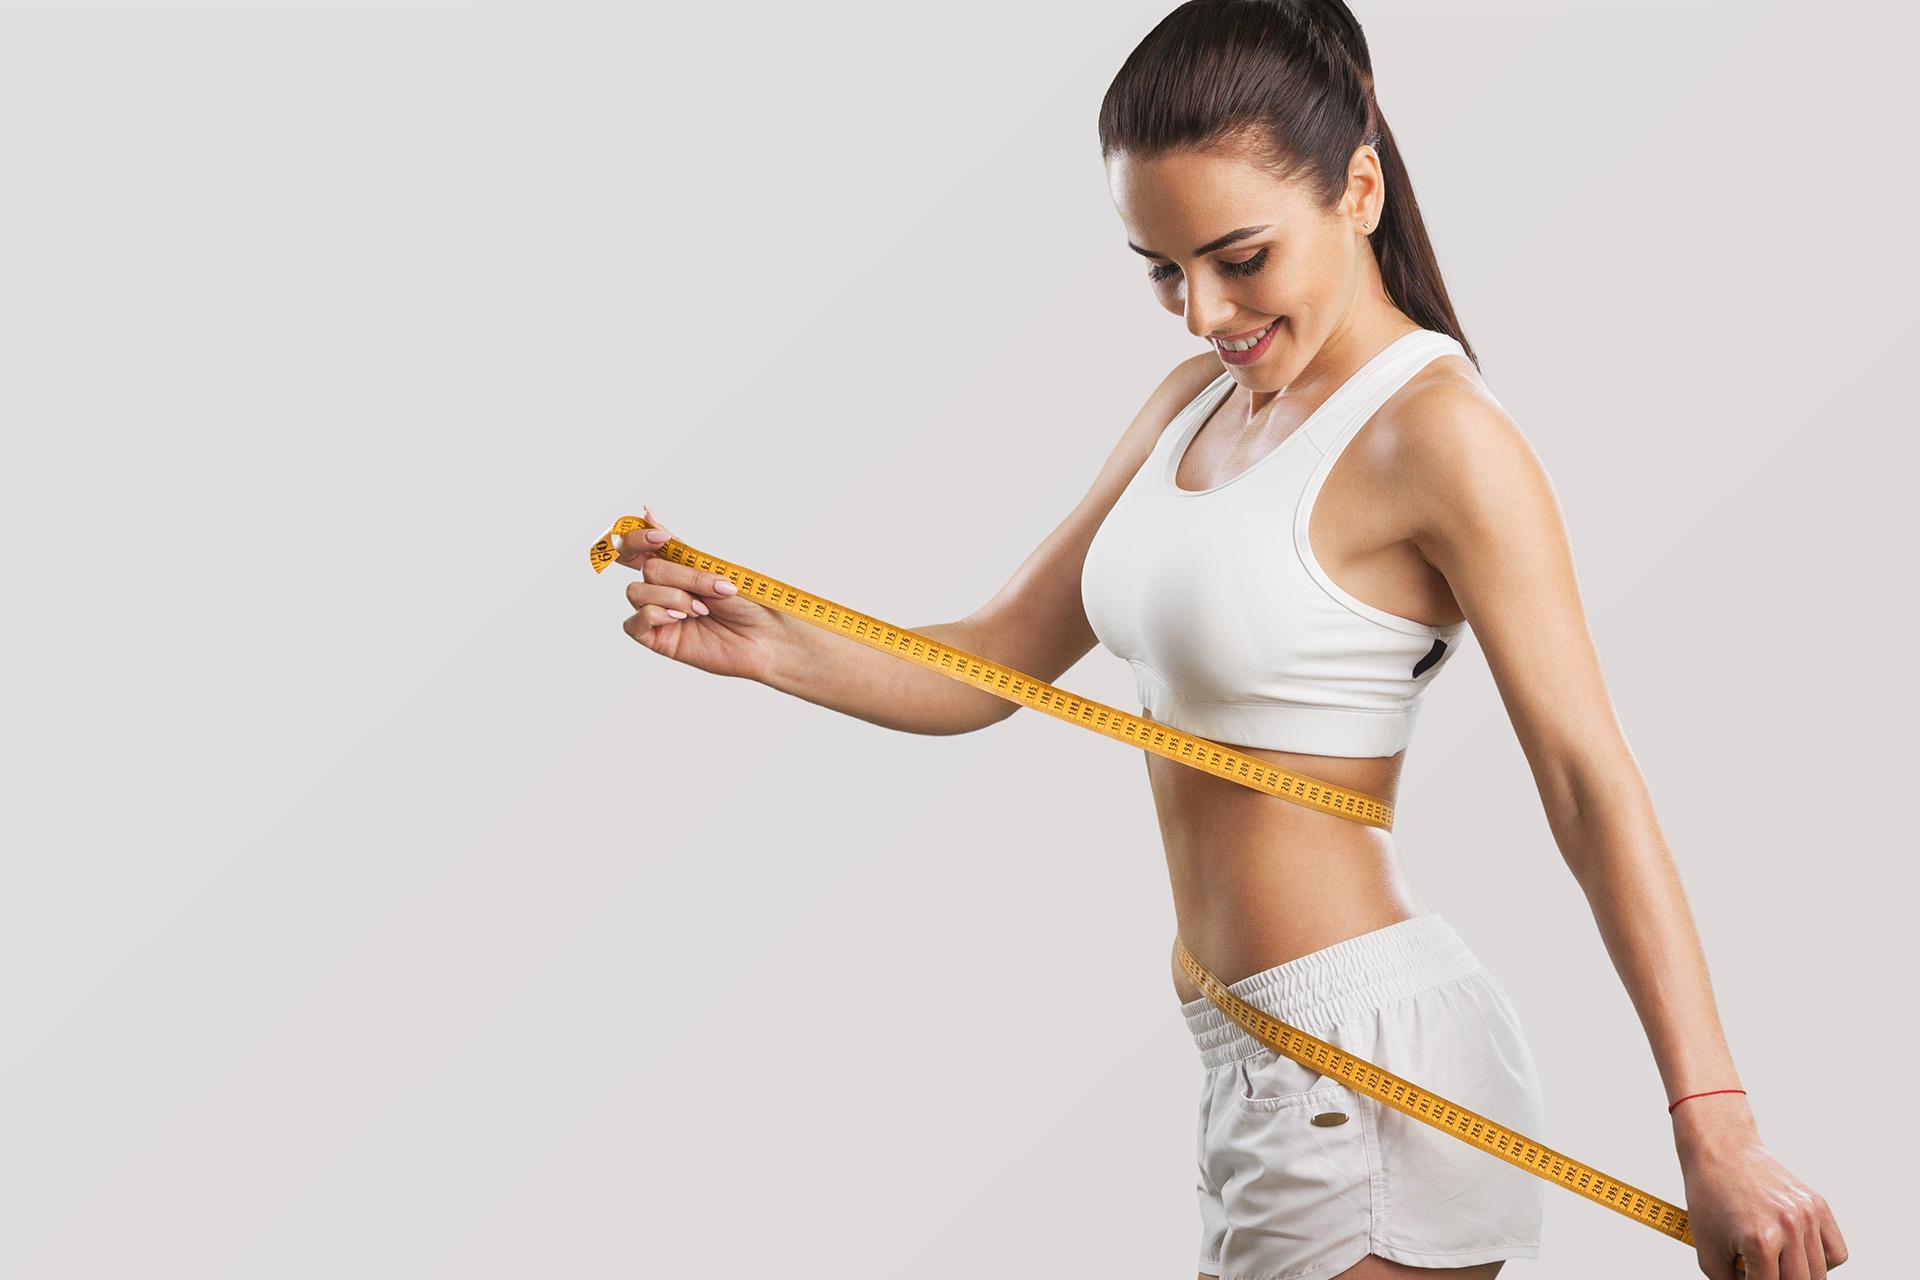 Gewichtsreduktion-Entgiftung-Fastenkur